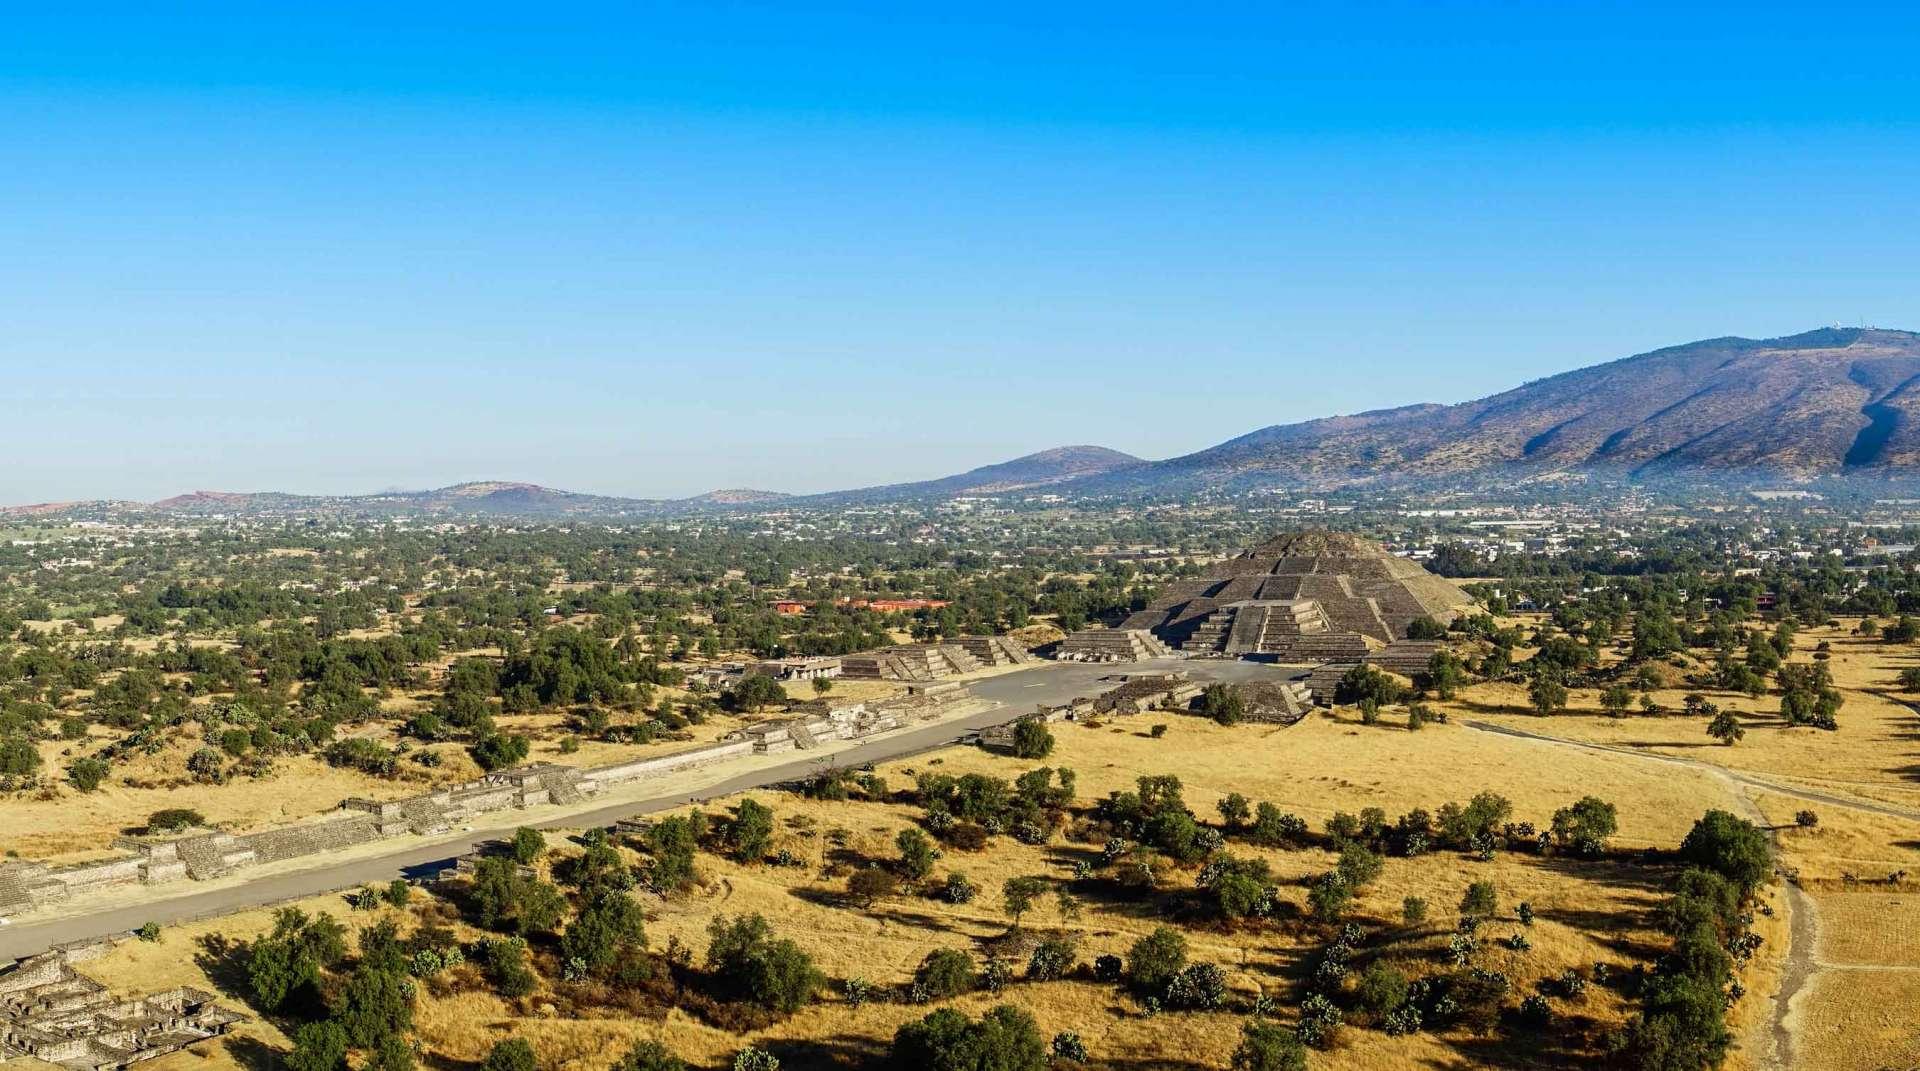 Teotihuacan Pyramids Mexico City Enrico Pescantini photographer 3